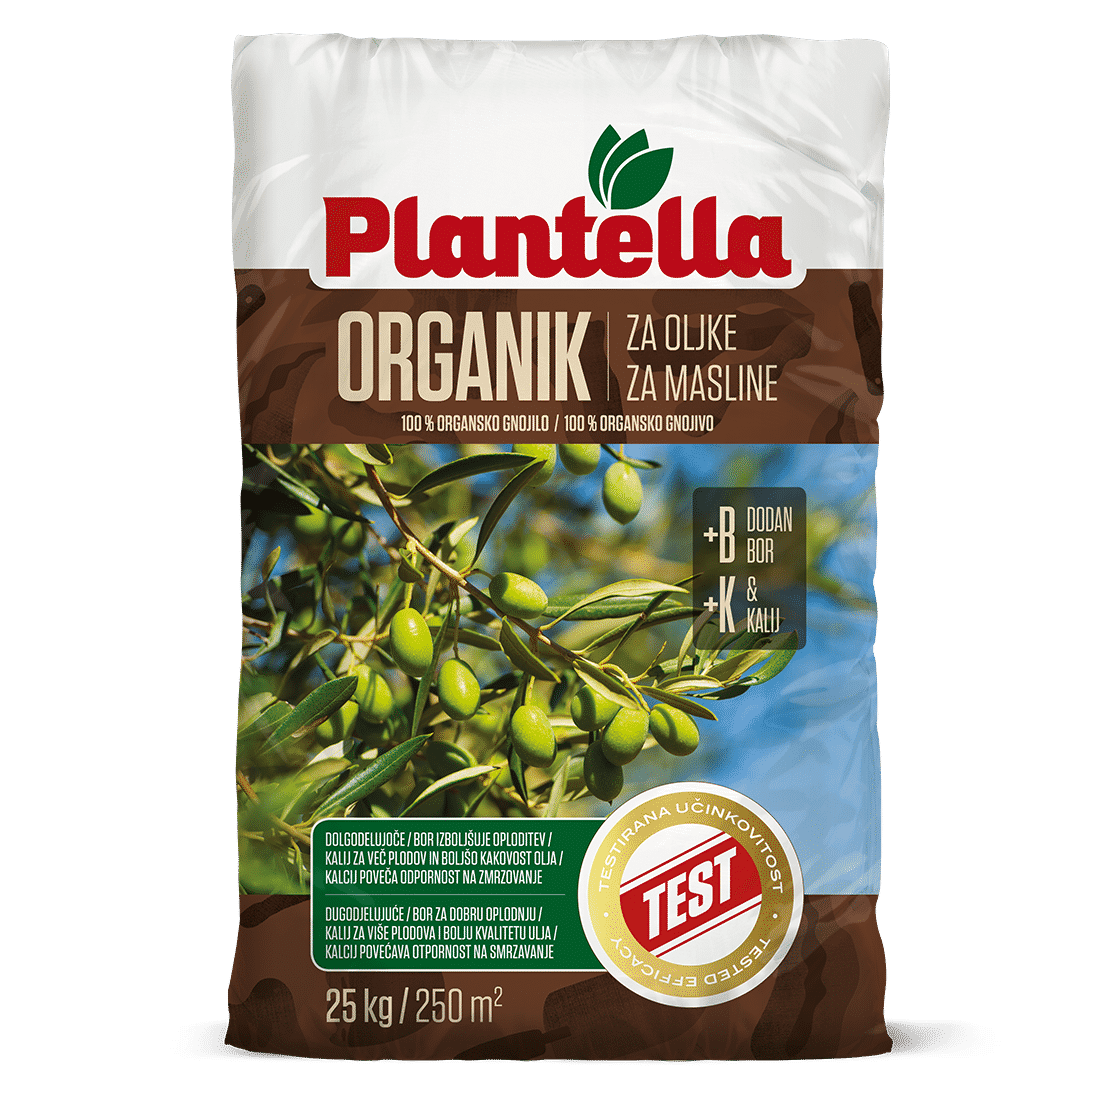 Plantella Organik za oljke 25 kg